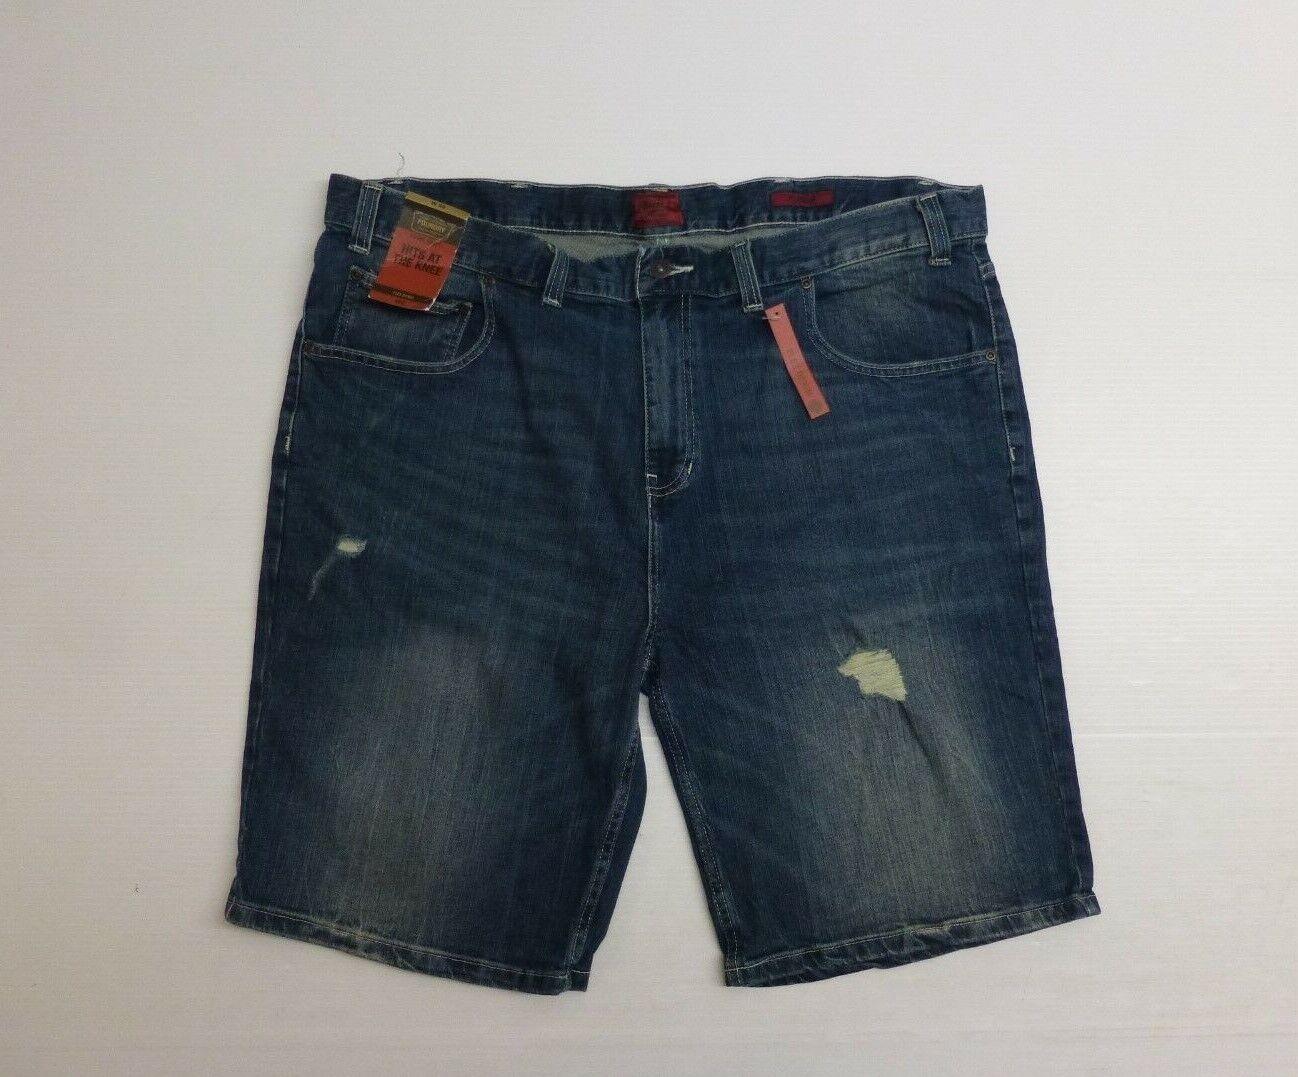 Foundry Supply Co Mens Sz 46 bluee Medium Stone Wash Distressed Denim Shorts NWT